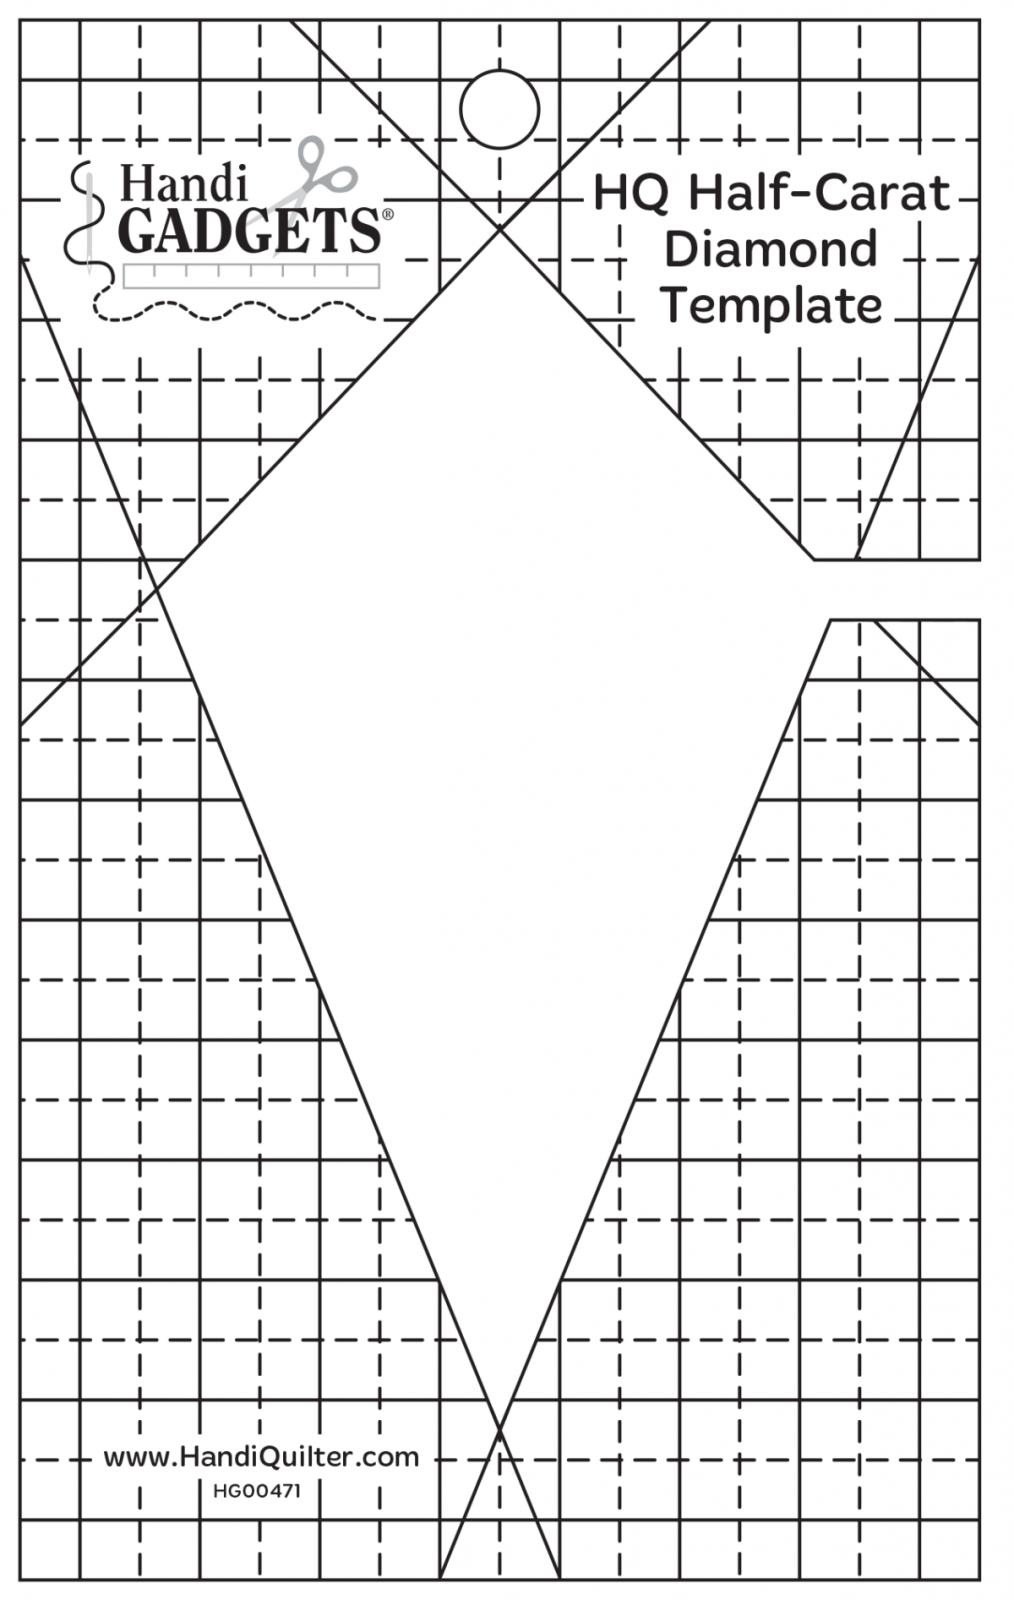 HQ half-carat Diamond Template